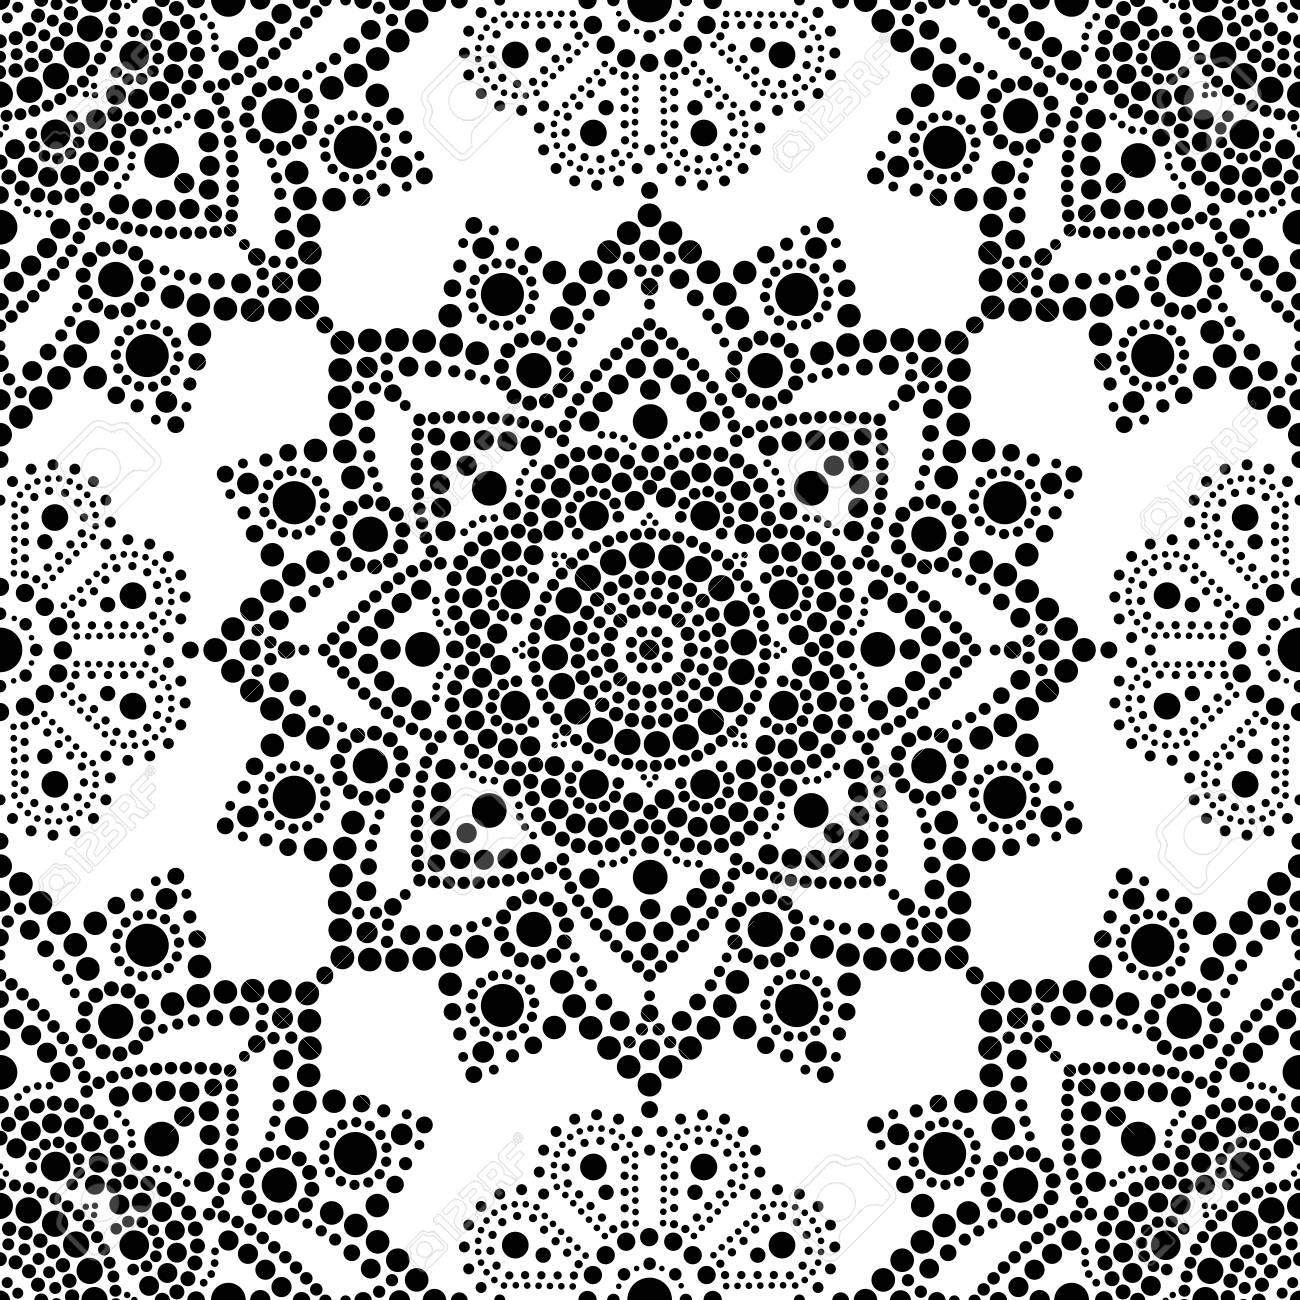 Aboriginal Dot Painting Seamless Pattern Mandala Bohemian Vector Art Retro Folk Design Inspired